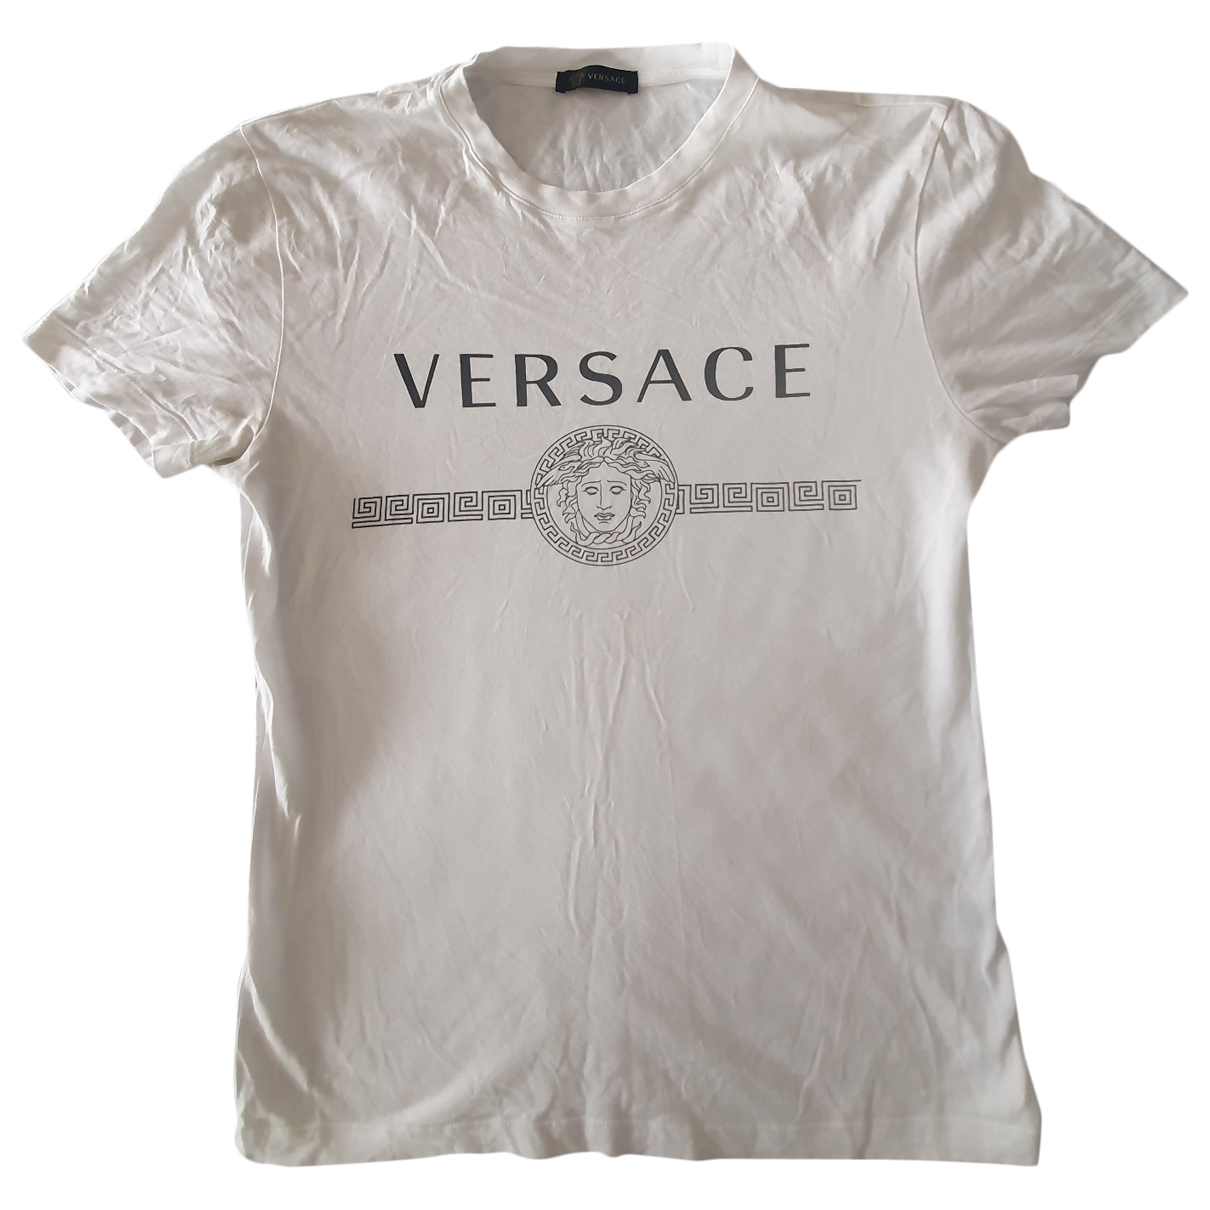 Versace \N White Cotton T-shirts for Men S International